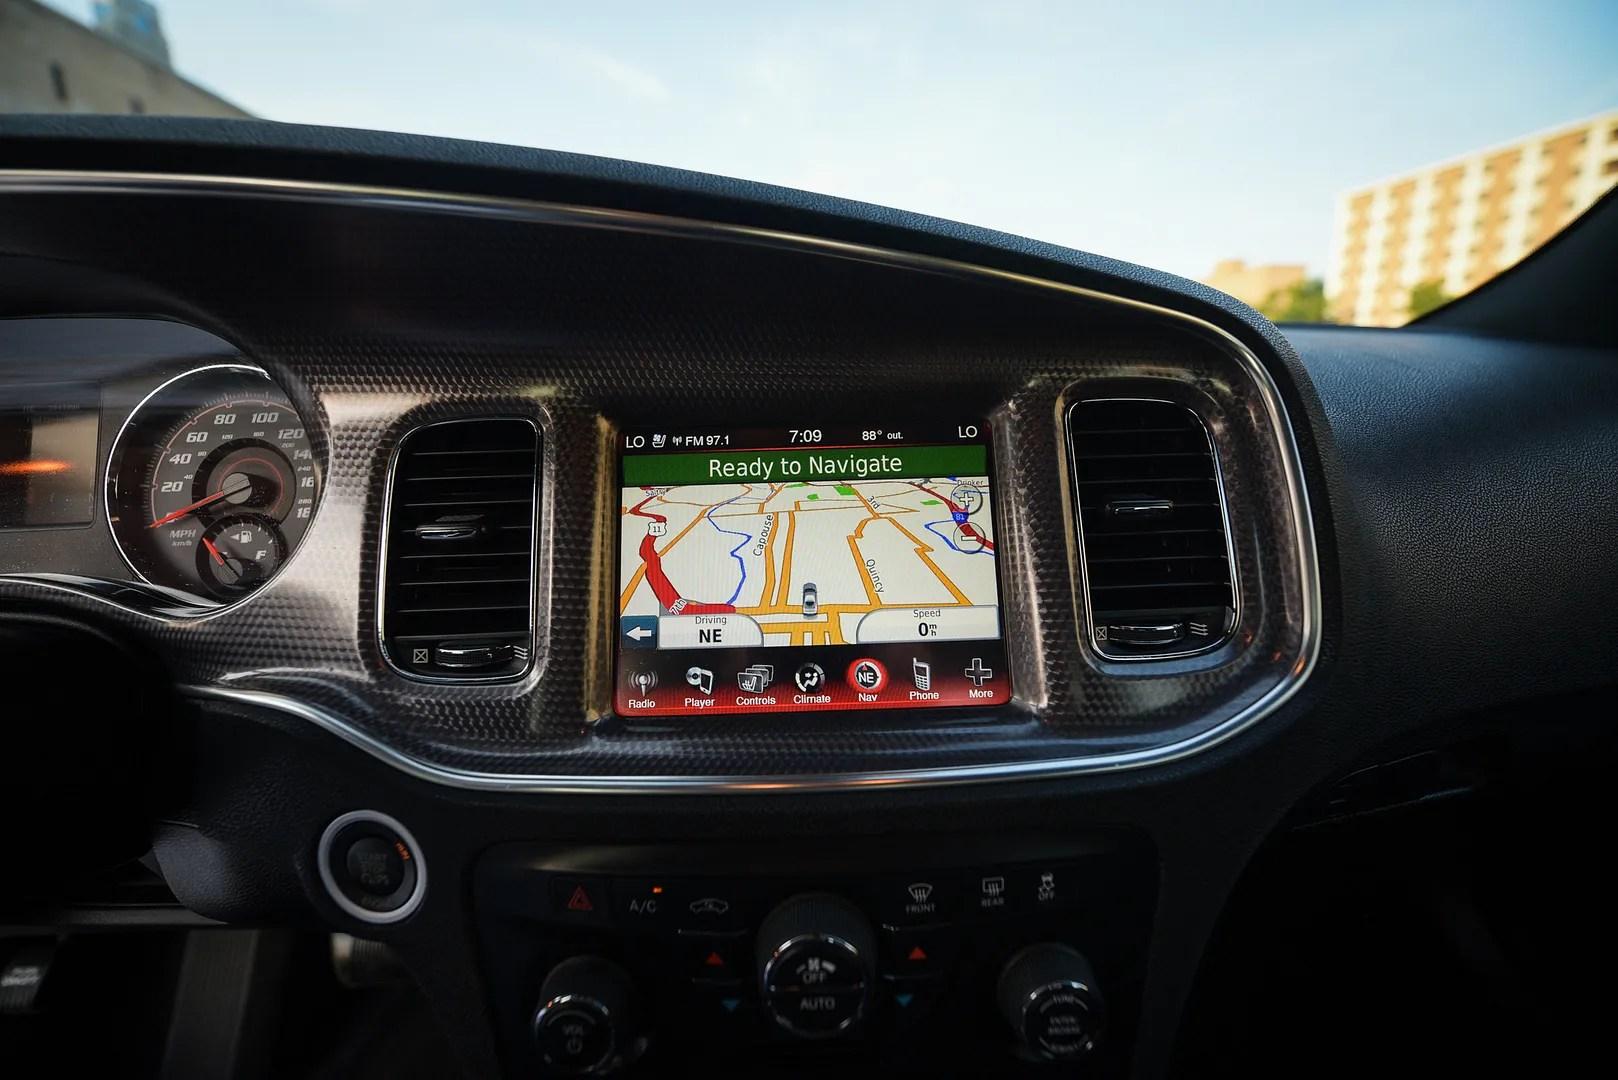 photo charger-serges-auto-sales-northeast-pa-2012-srt8--31_zps6blnyfs0.jpg